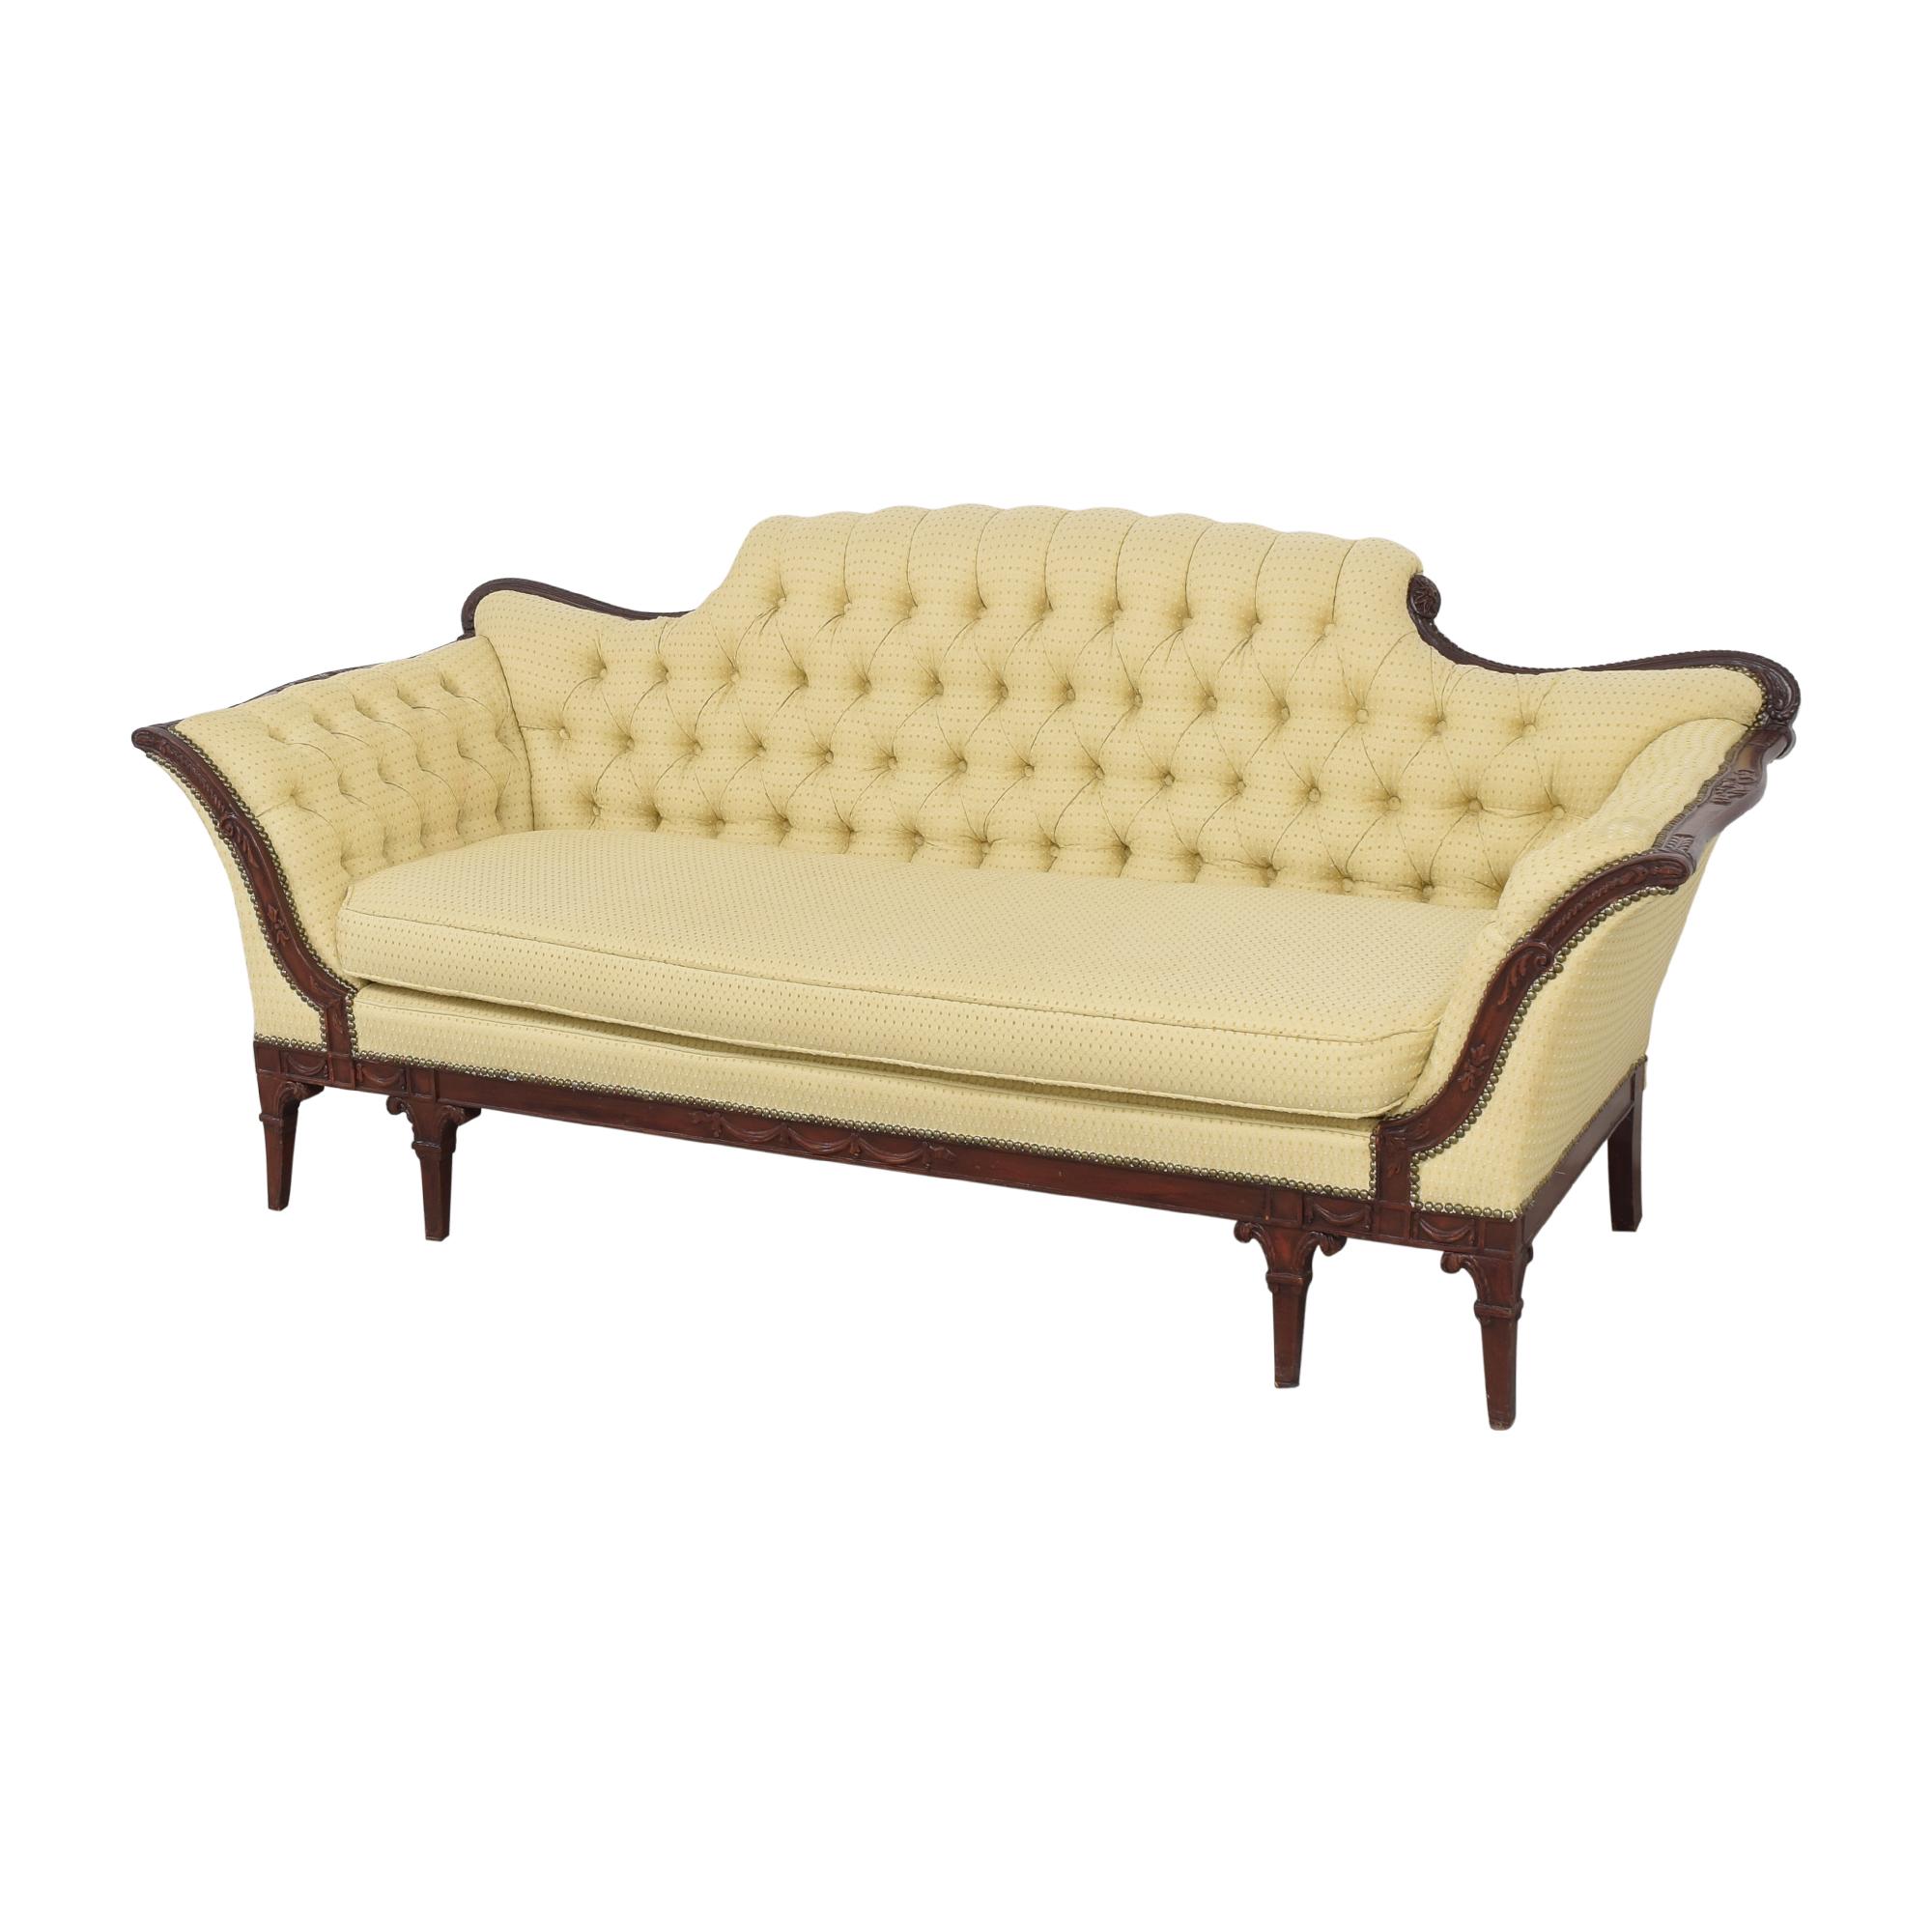 buy Vintage Tufted Camelback Sofa